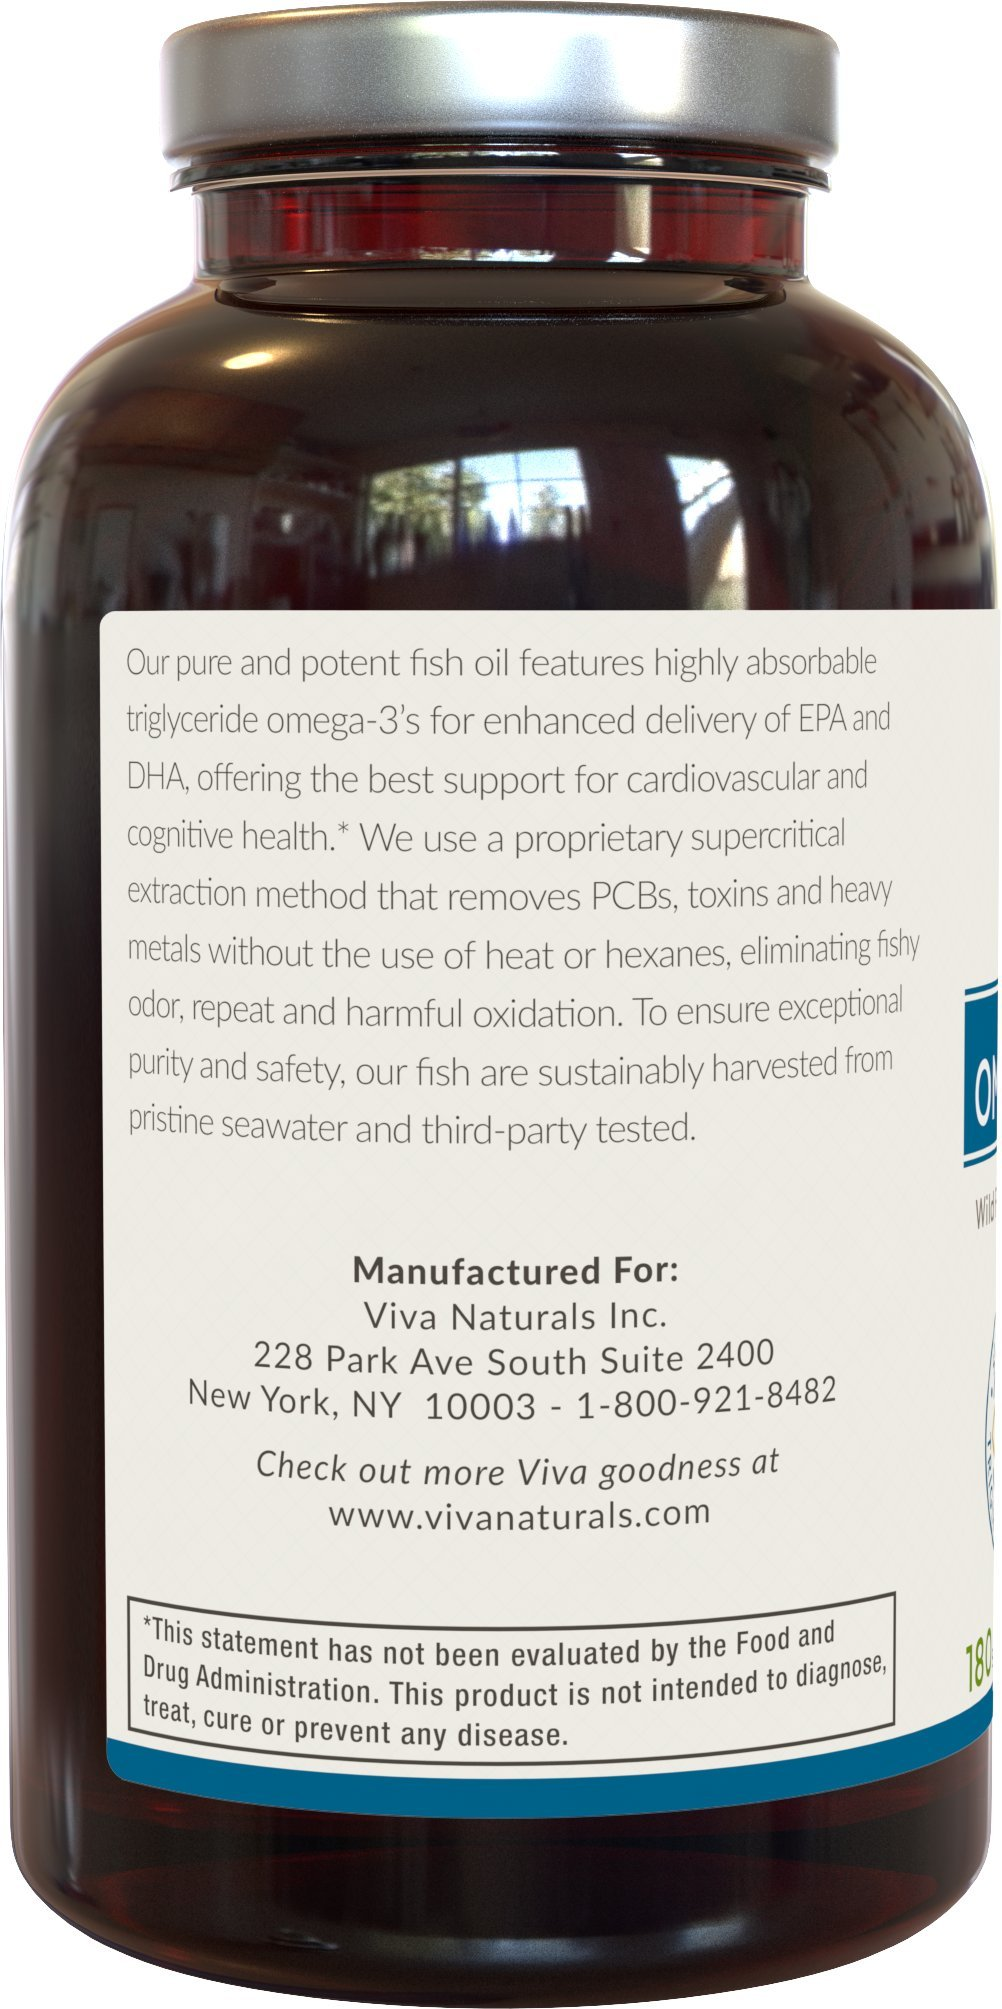 Galleon viva naturals omega 3 fish oil supplement 180 for Viva fish oil